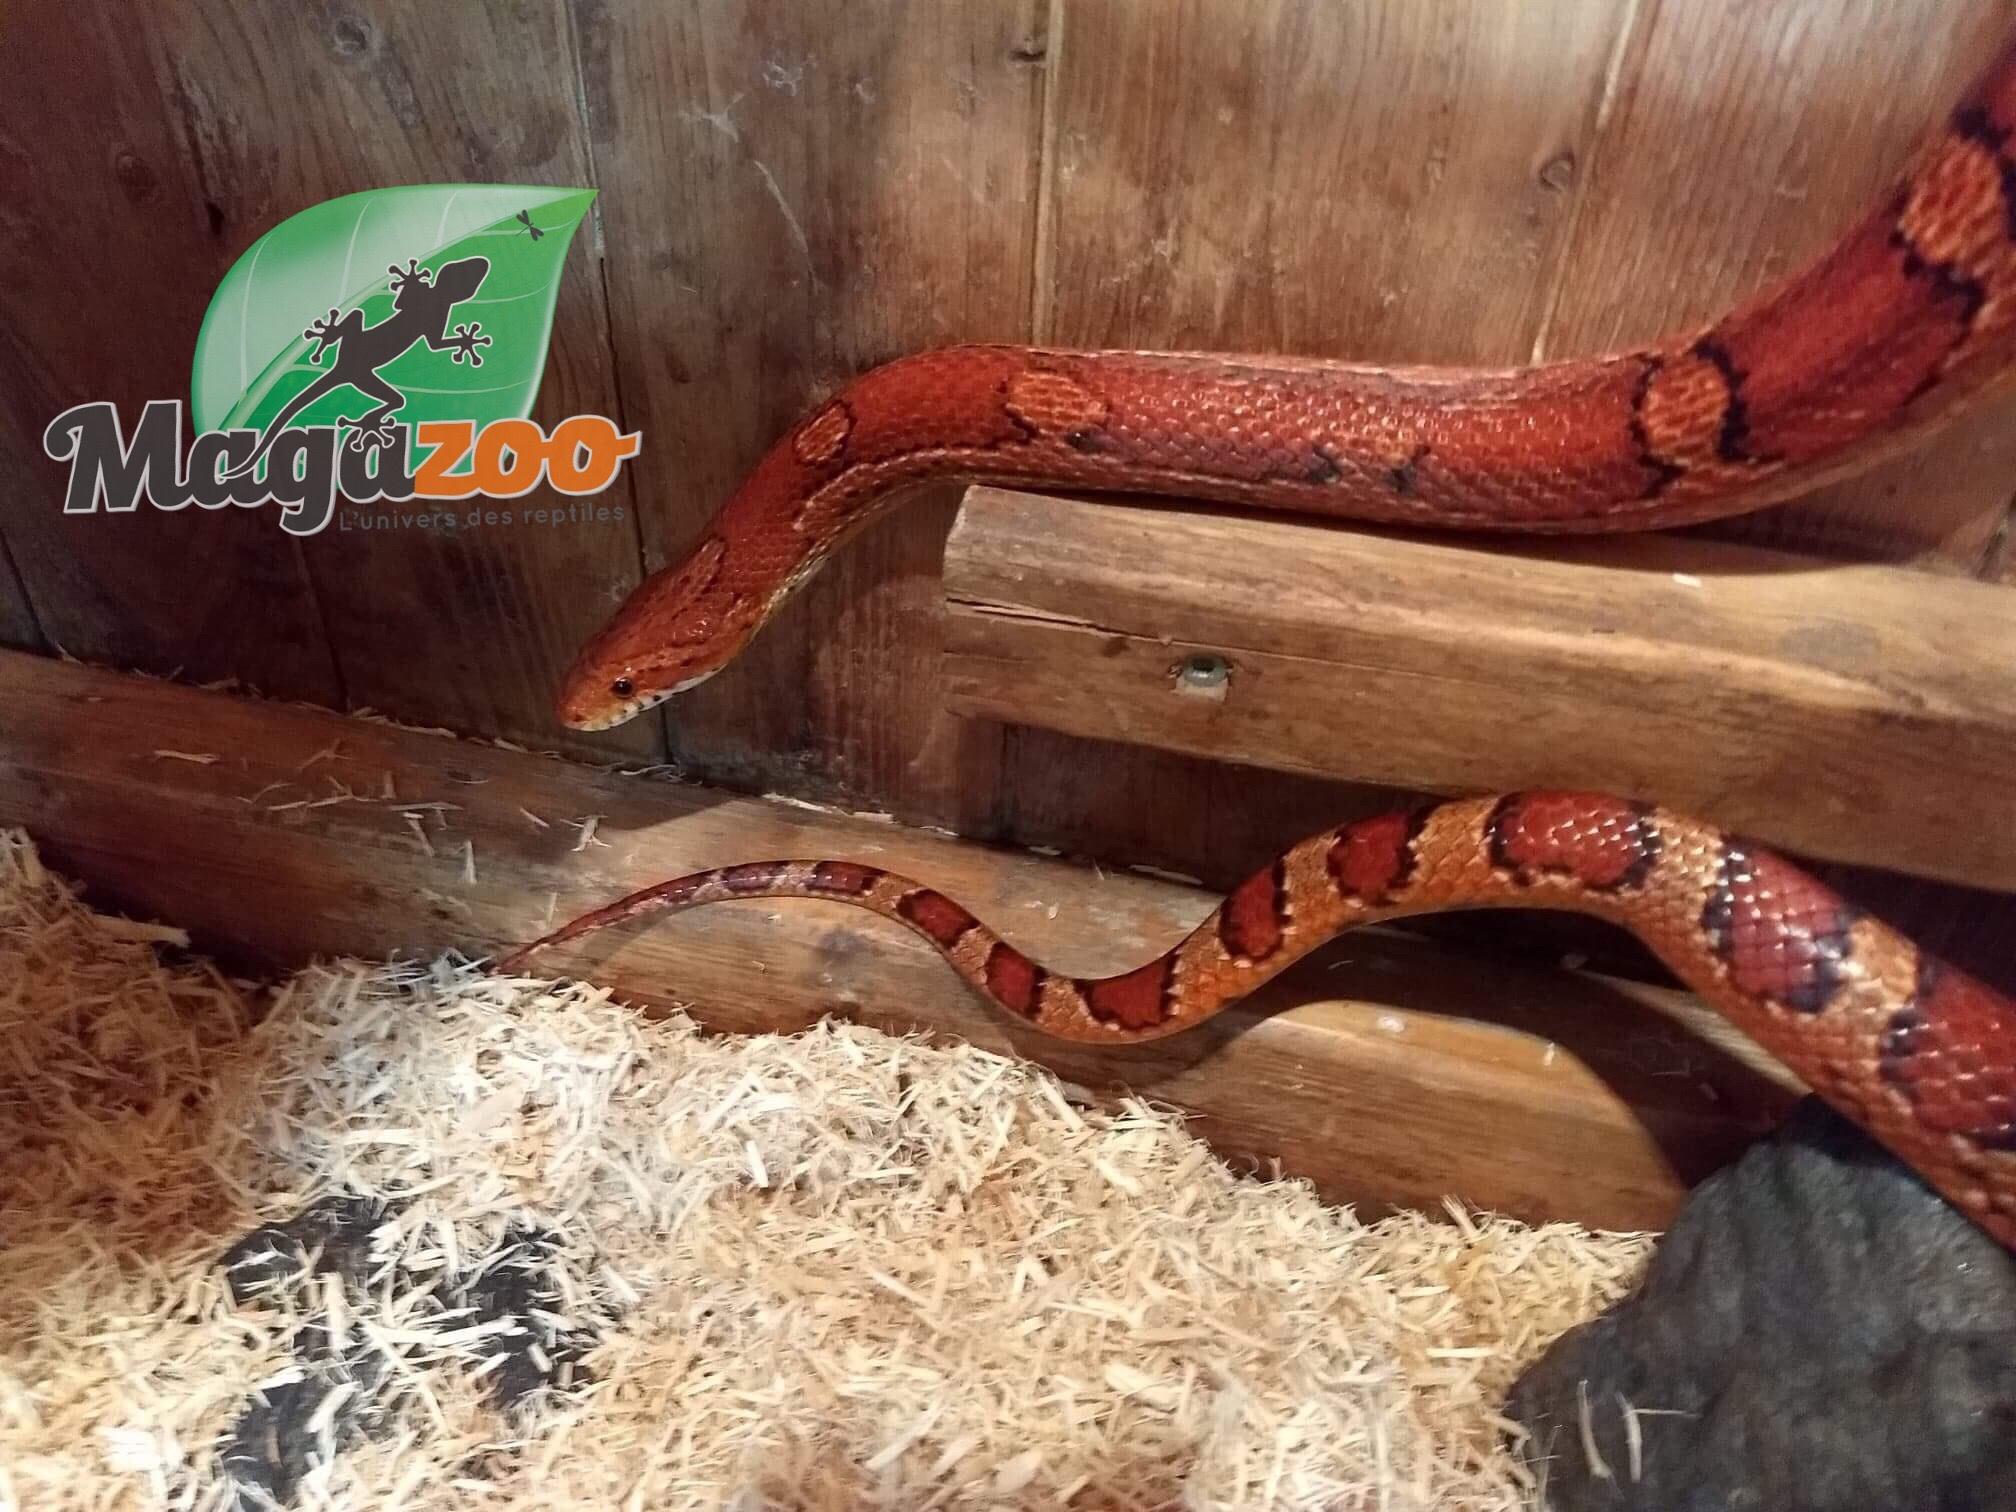 Magazoo Serpent des blés (Mâle adulte) okeetee